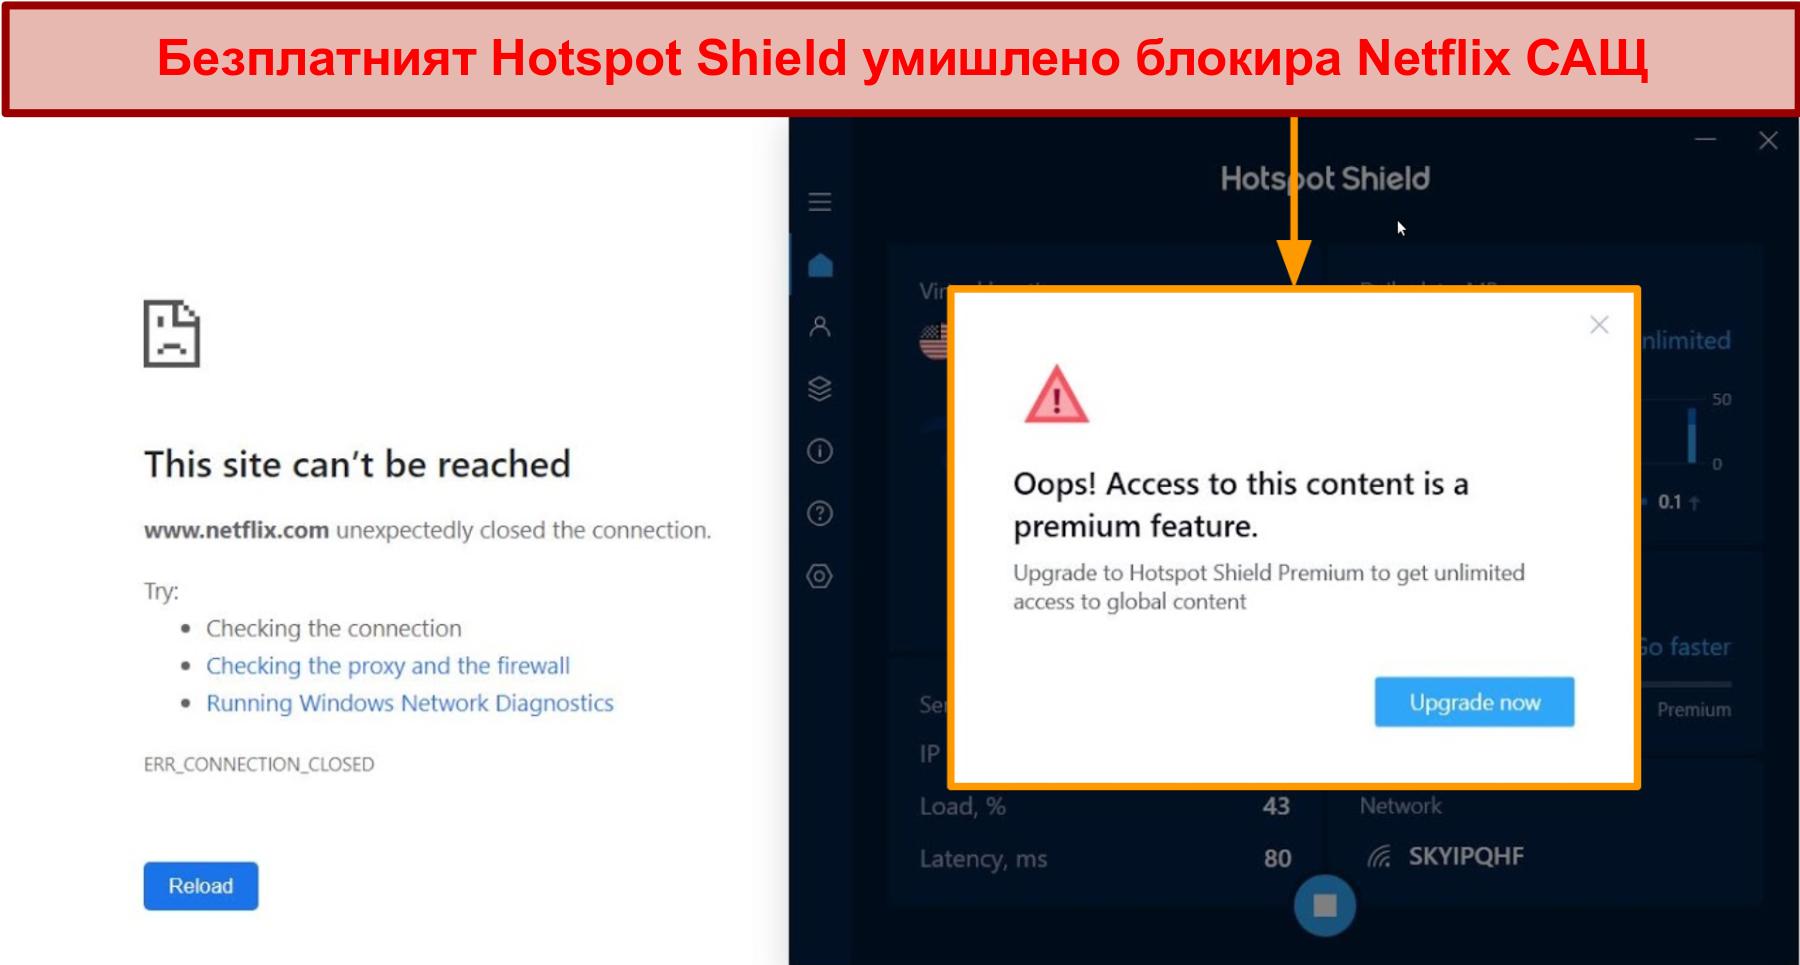 показан скрийншот HotspotShield блокира Netflix умишлено